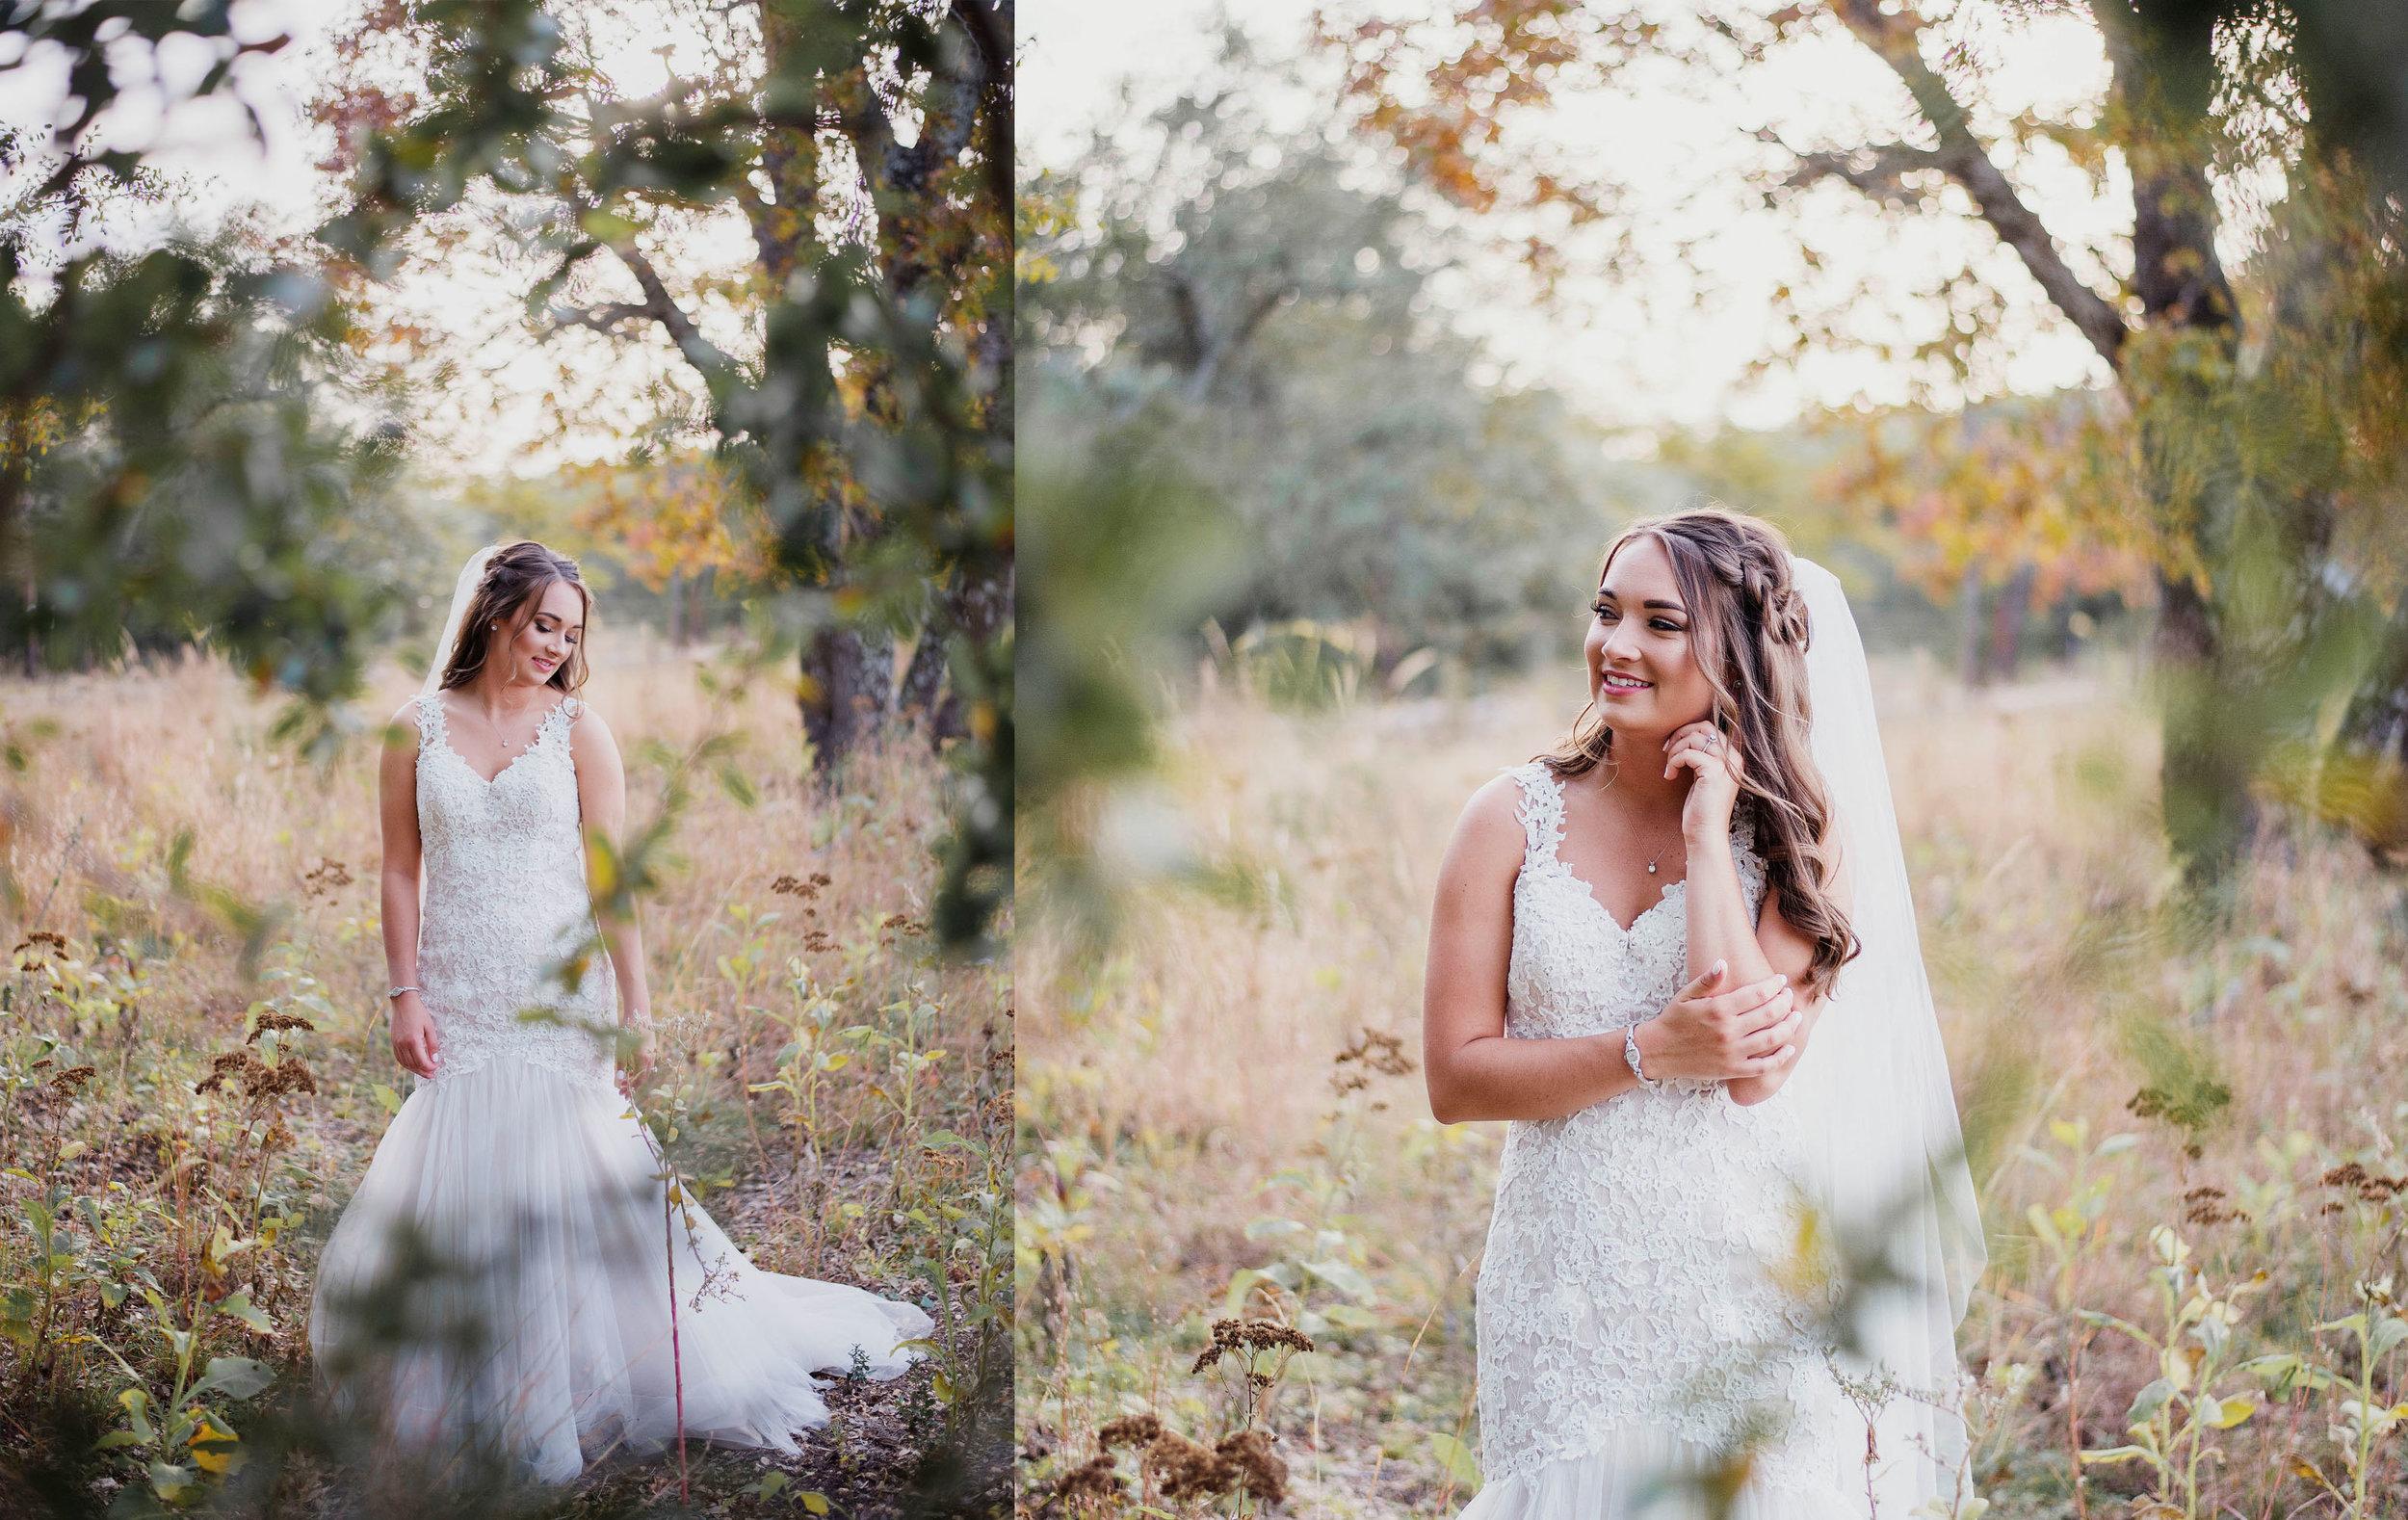 EffJay Photography Destination Wedding Photographer Austin TX Bridal Session La Estancia Bella005.jpg